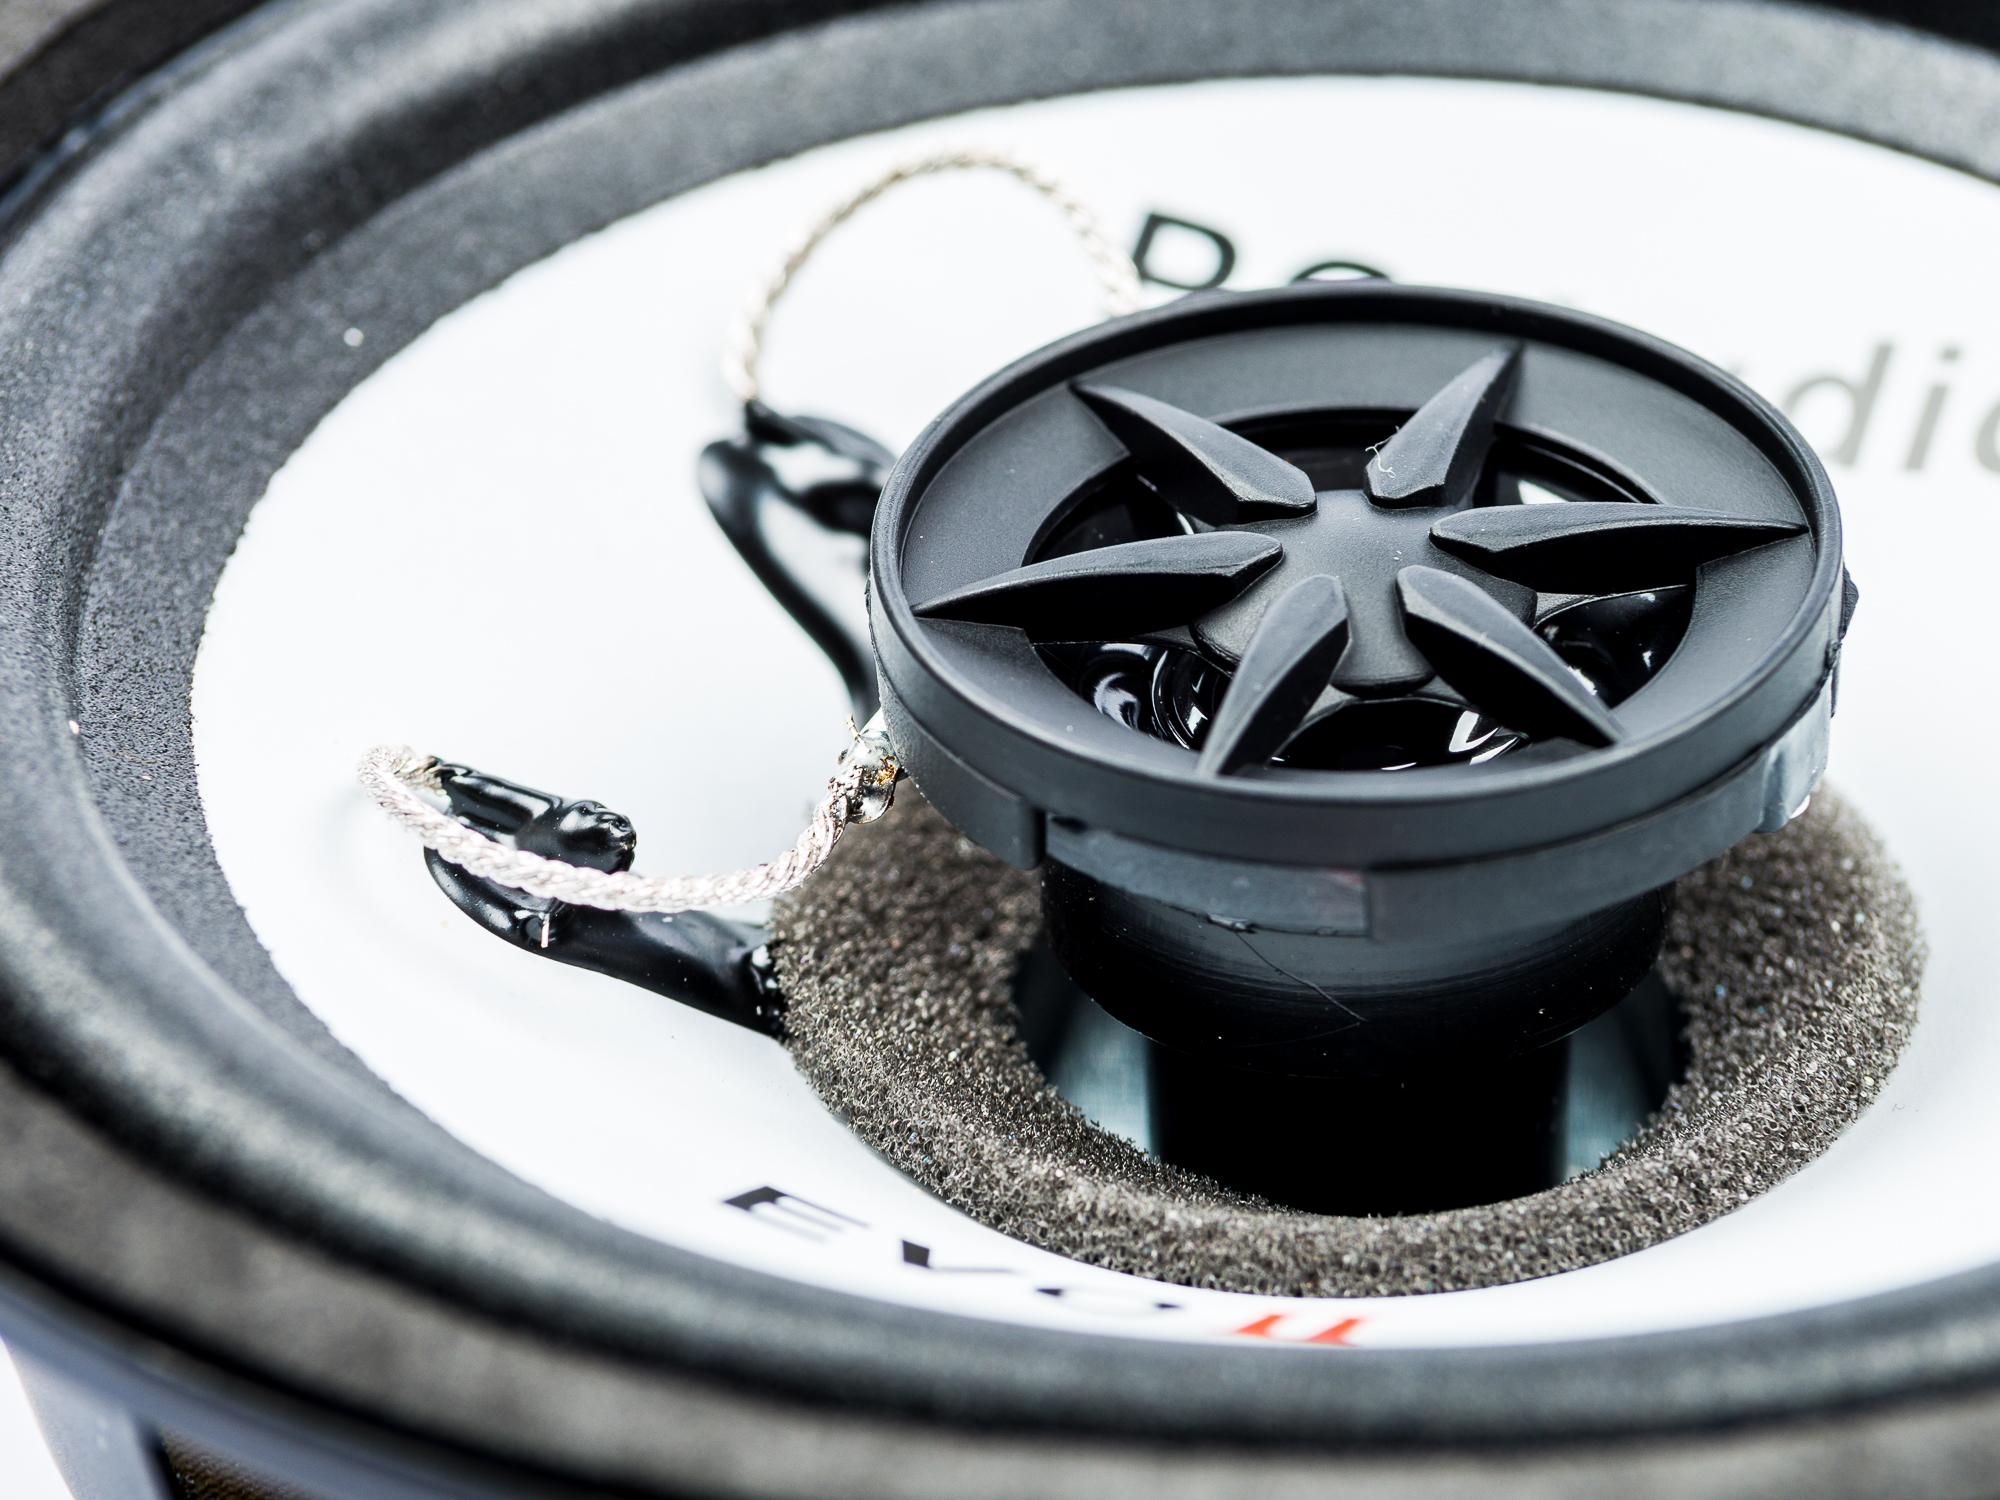 Seat Arosa VW Lupo New Beetle Skoda Octavia Lautsprecher Einbauset Tür vorne PG Audio  – Bild 2